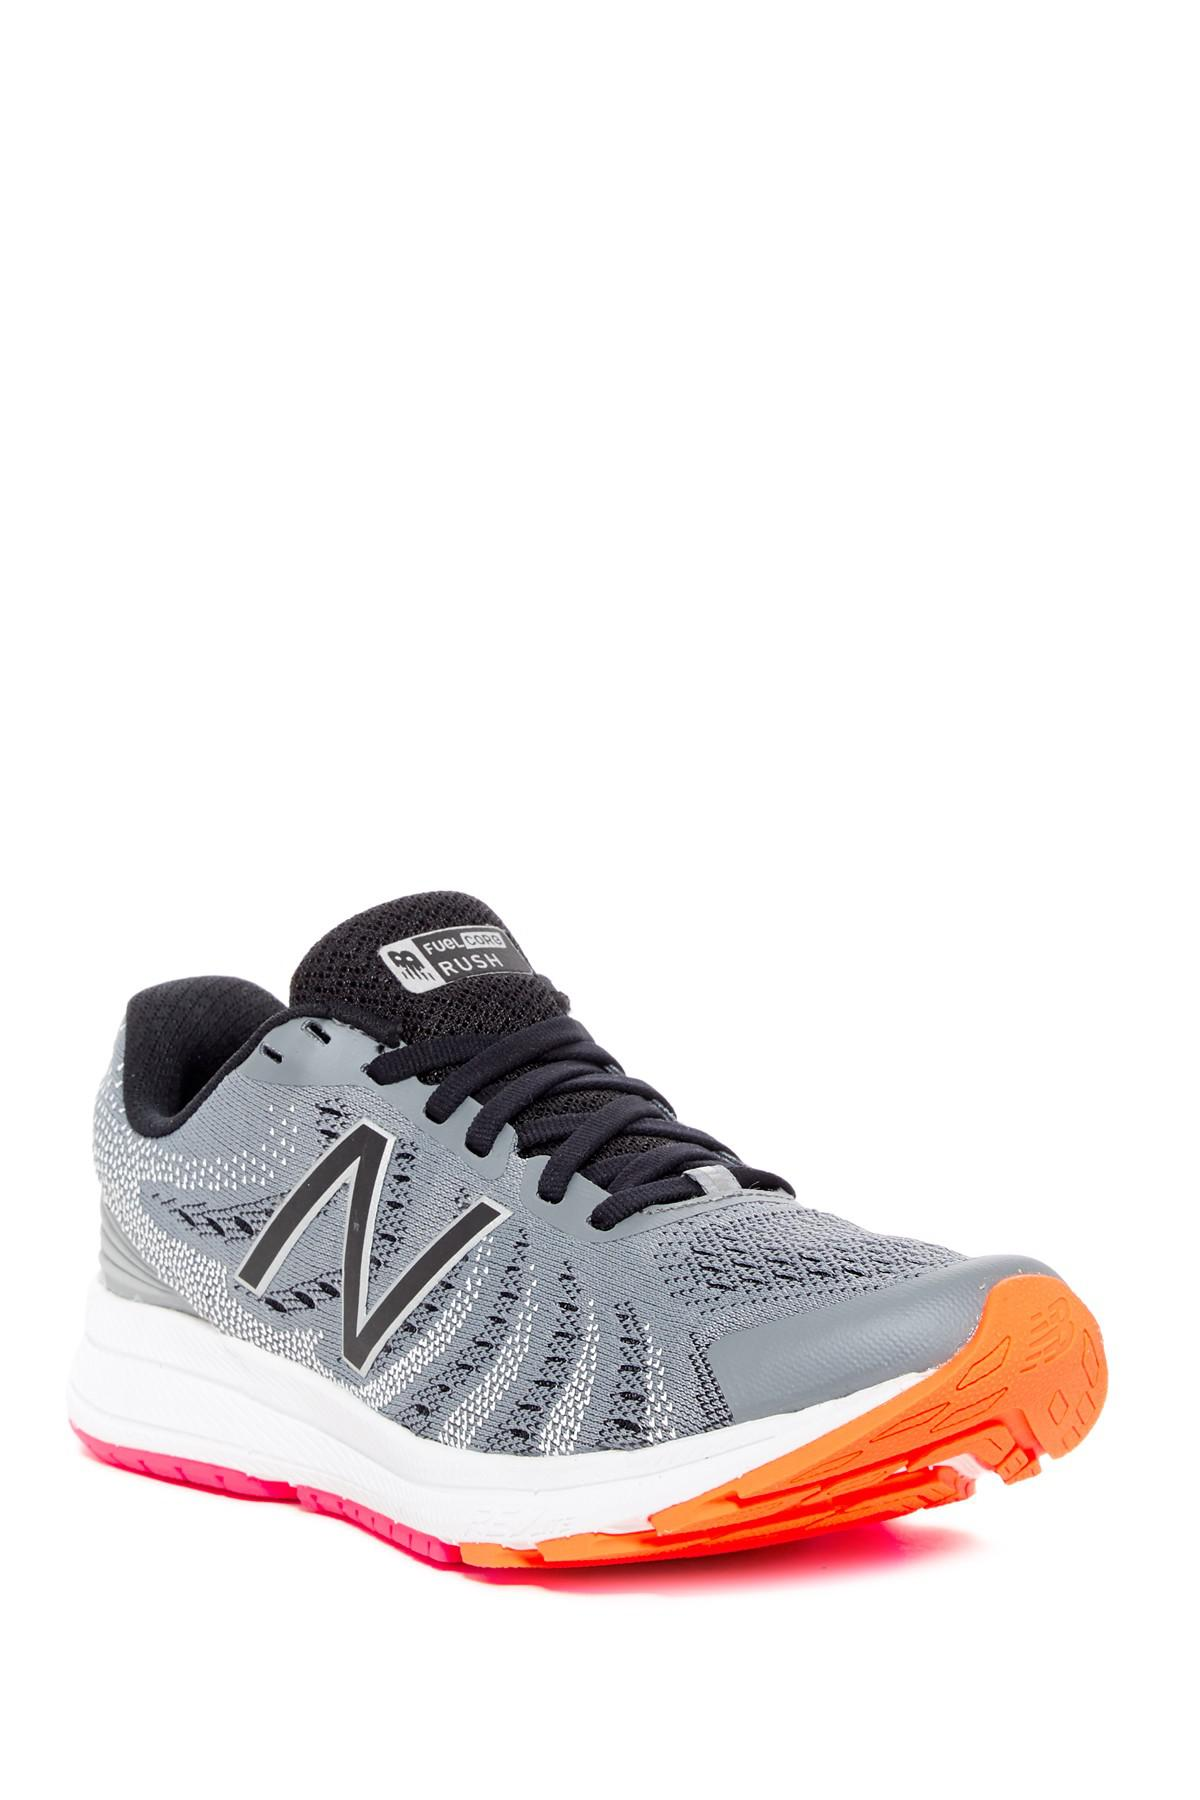 new balance 995cja athletic sneaker